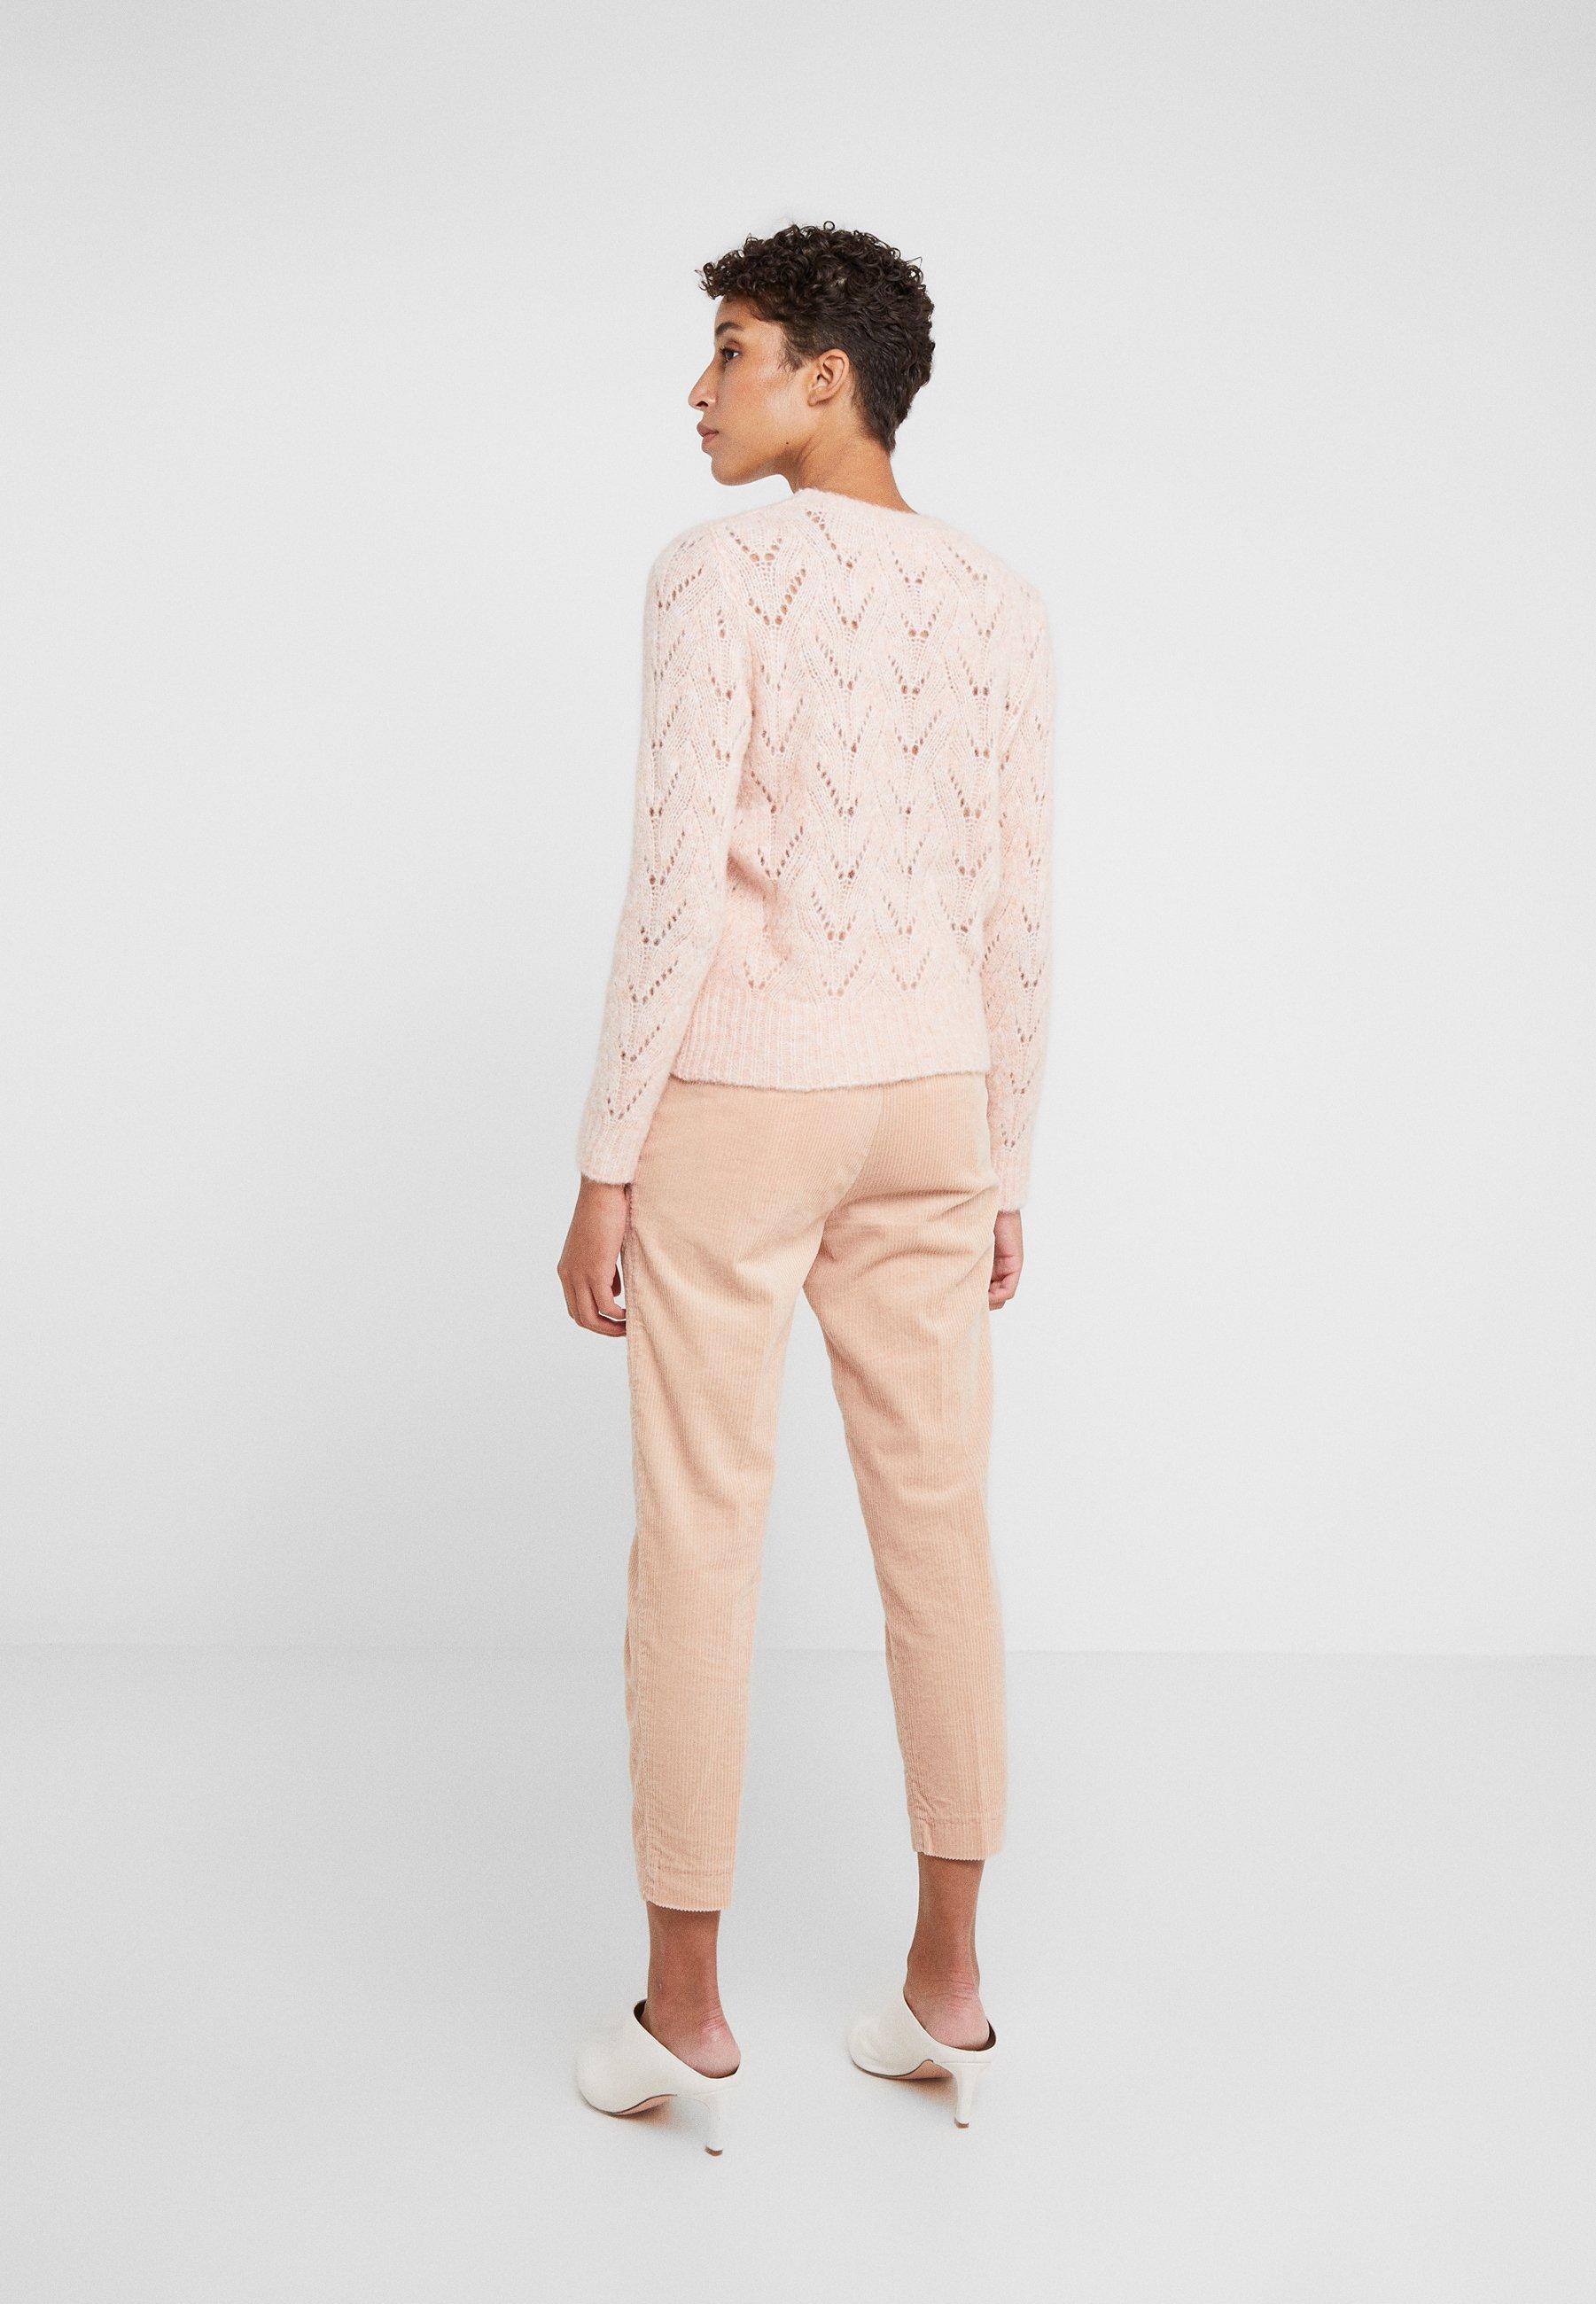 Lovechild Lovechild LunaPullover Soft Pink Lovechild LunaPullover Pink Soft Soft Pink Soft LunaPullover LunaPullover Lovechild 3JKulTF1c